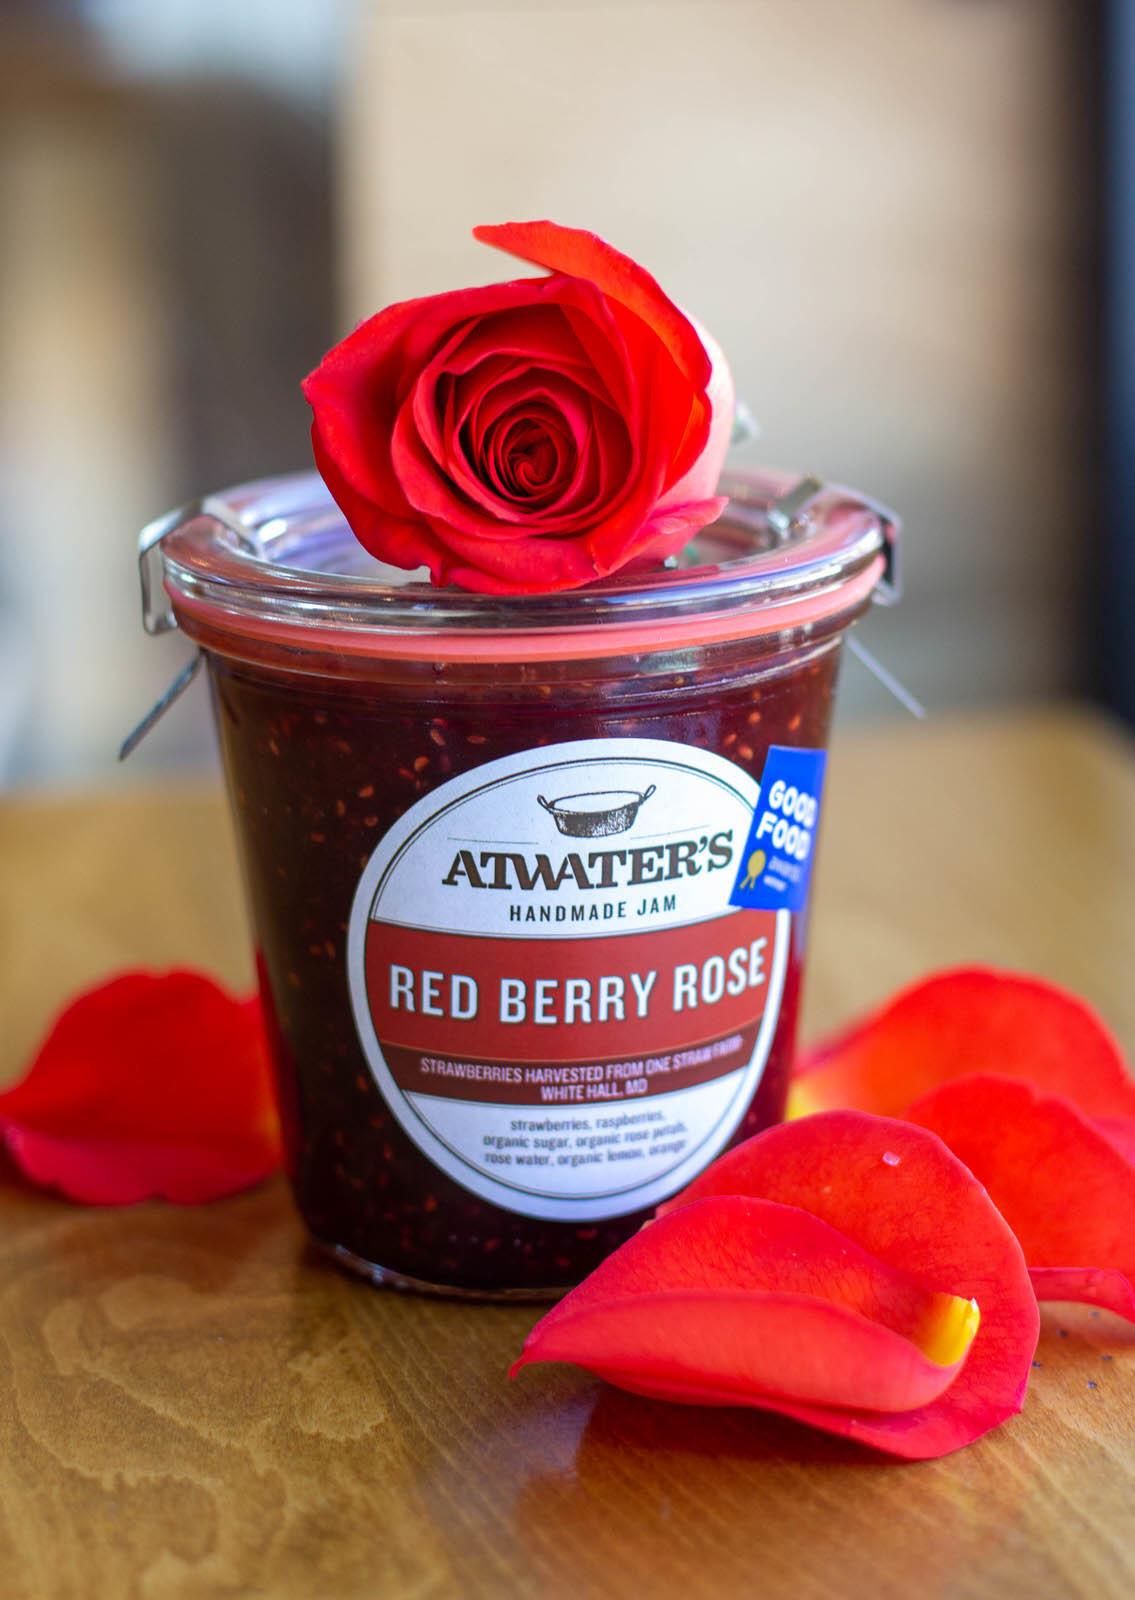 red-berry-rose-1-of-1-4.jpg#asset:125248